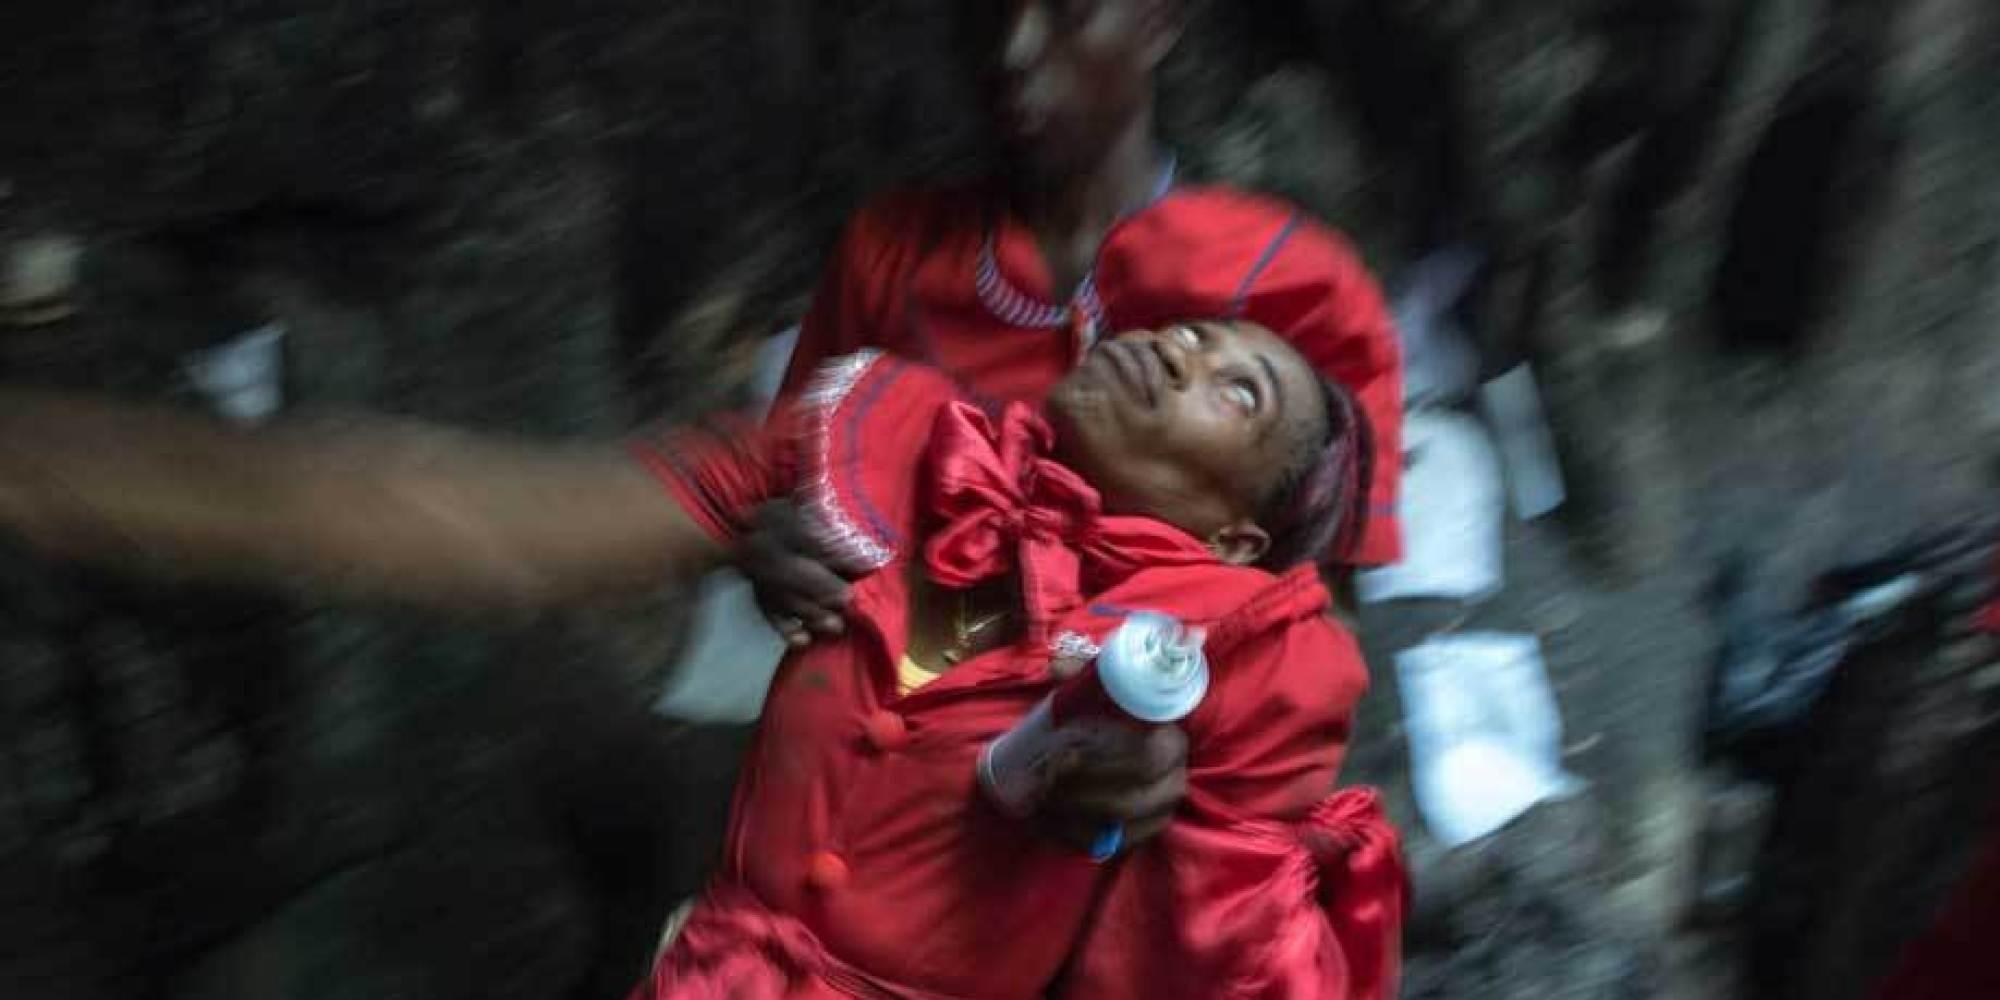 Graphic Photos Of Voodoo Rituals In Haiti  HuffPost